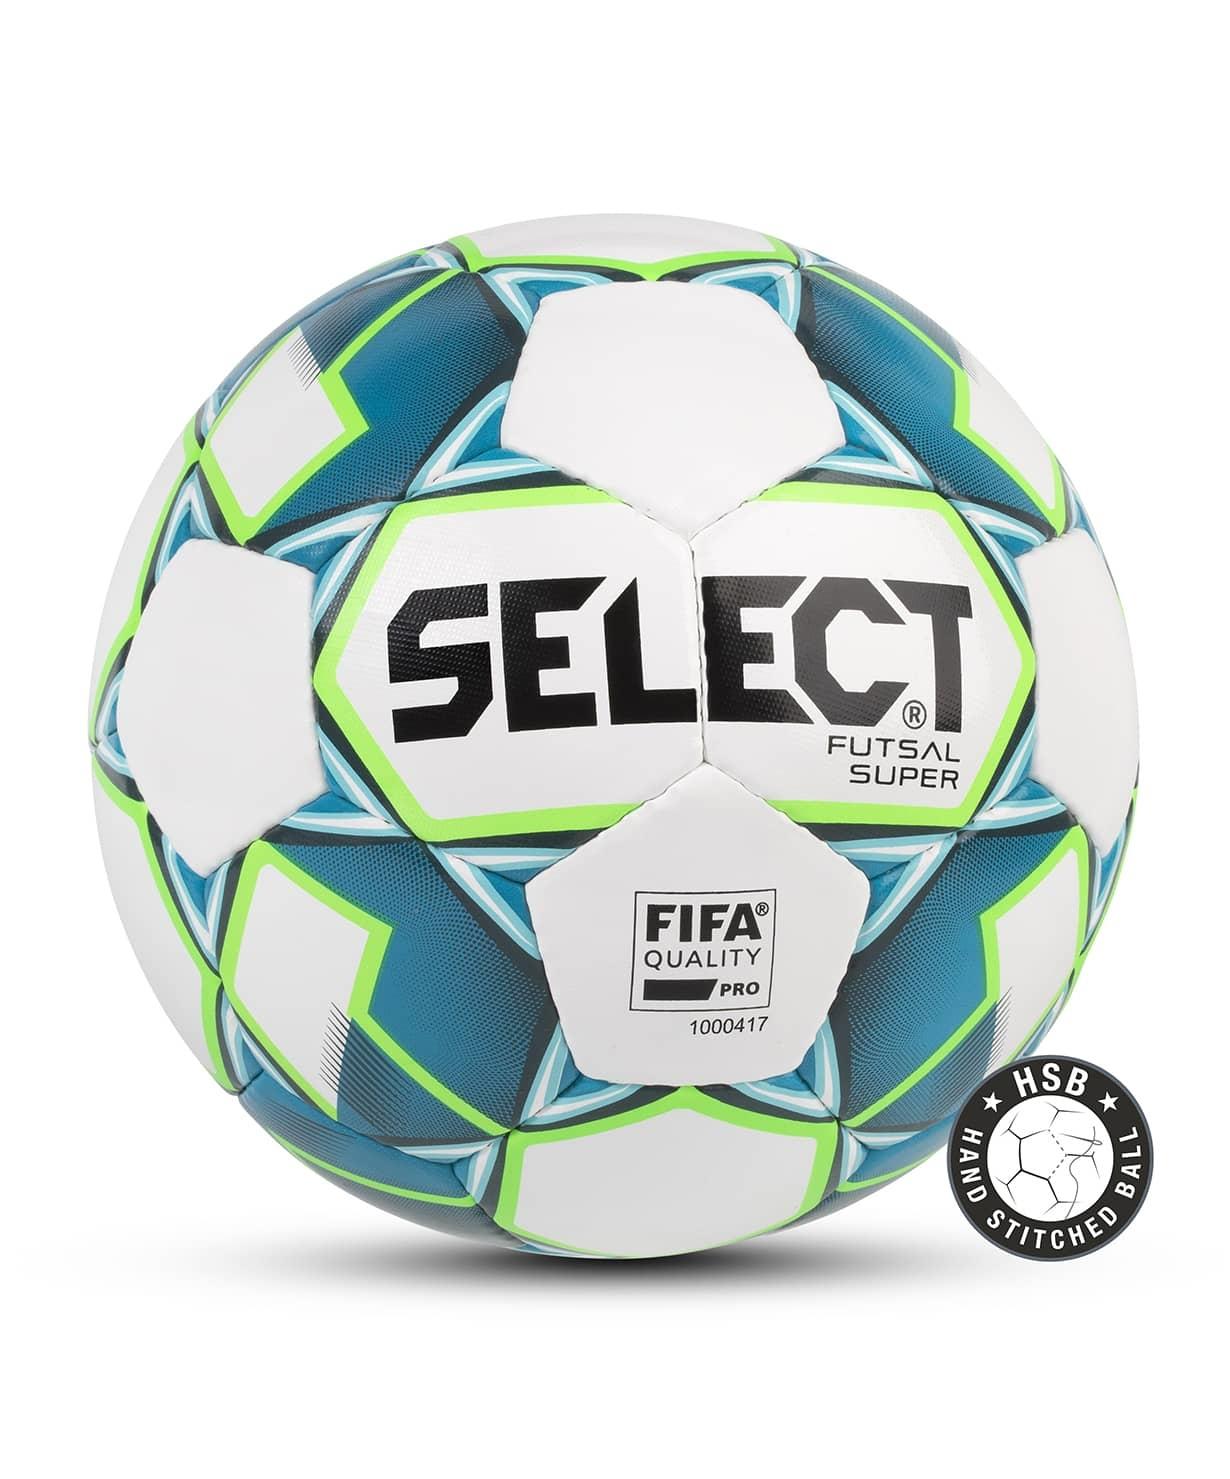 Мяч футзальный FUTSAL SUPER FIFA №4, бел/син/зел